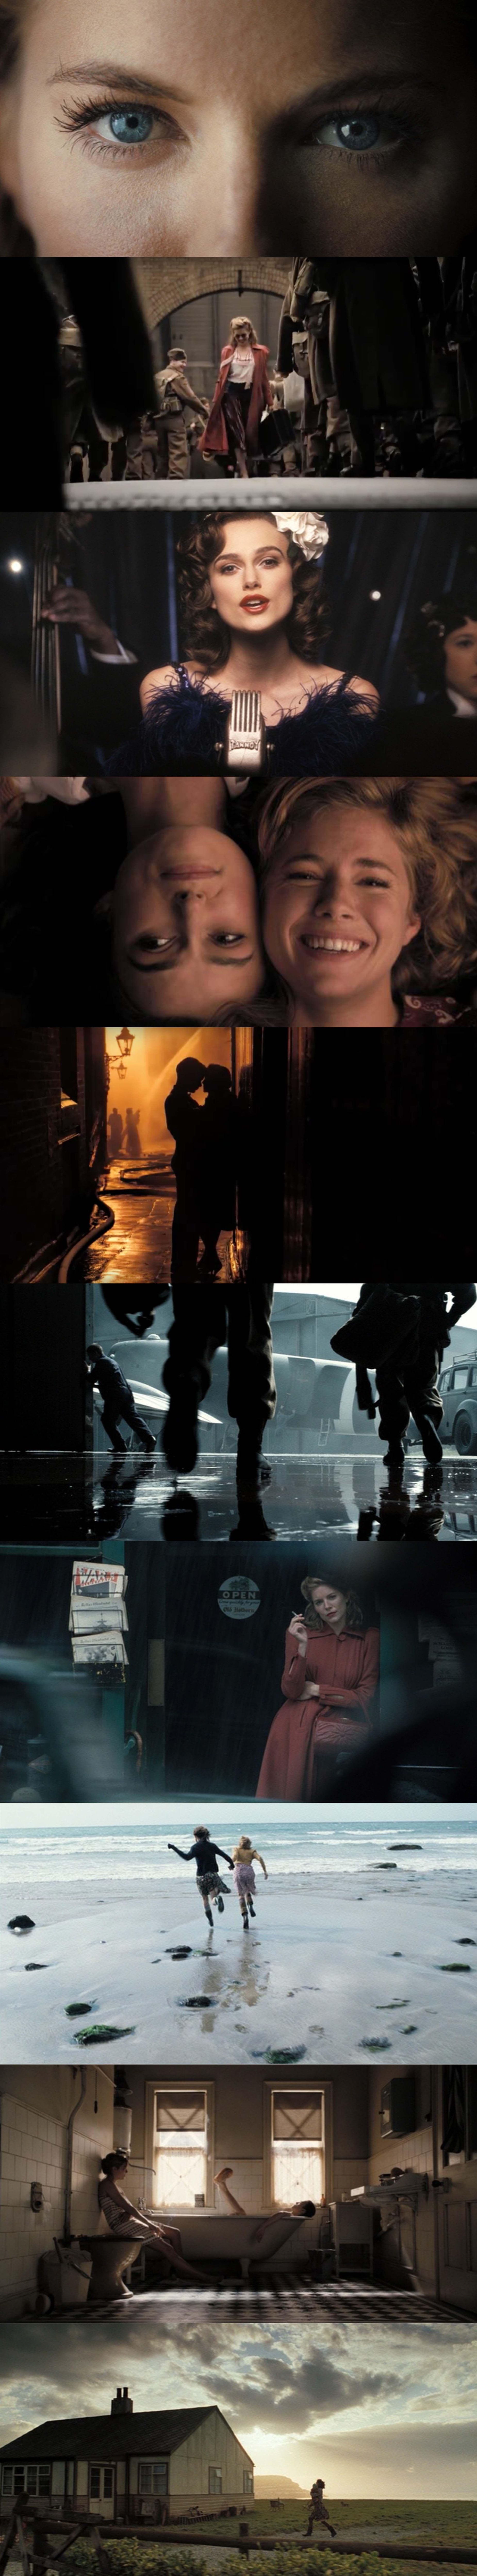 'The Edge of Love' (John Maybury, 2008) Cinematography by Jonathan Freeman